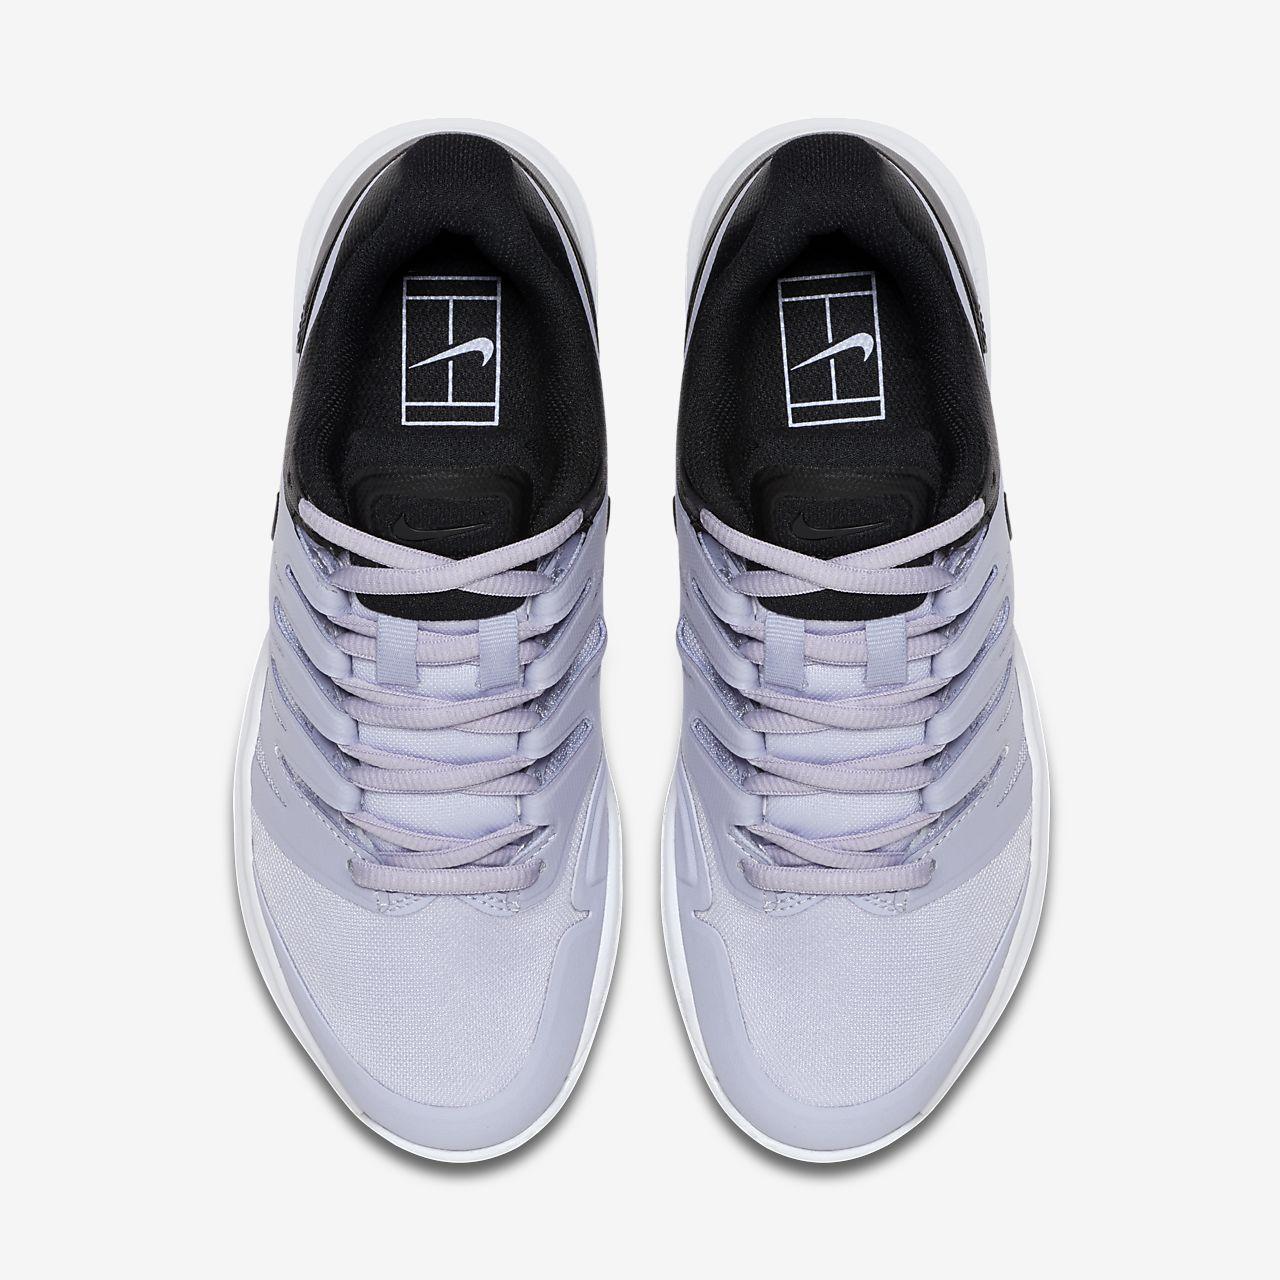 021f00bb529 Nike Air Zoom Prestige Clay Tennisschoen voor dames. Nike.com NL